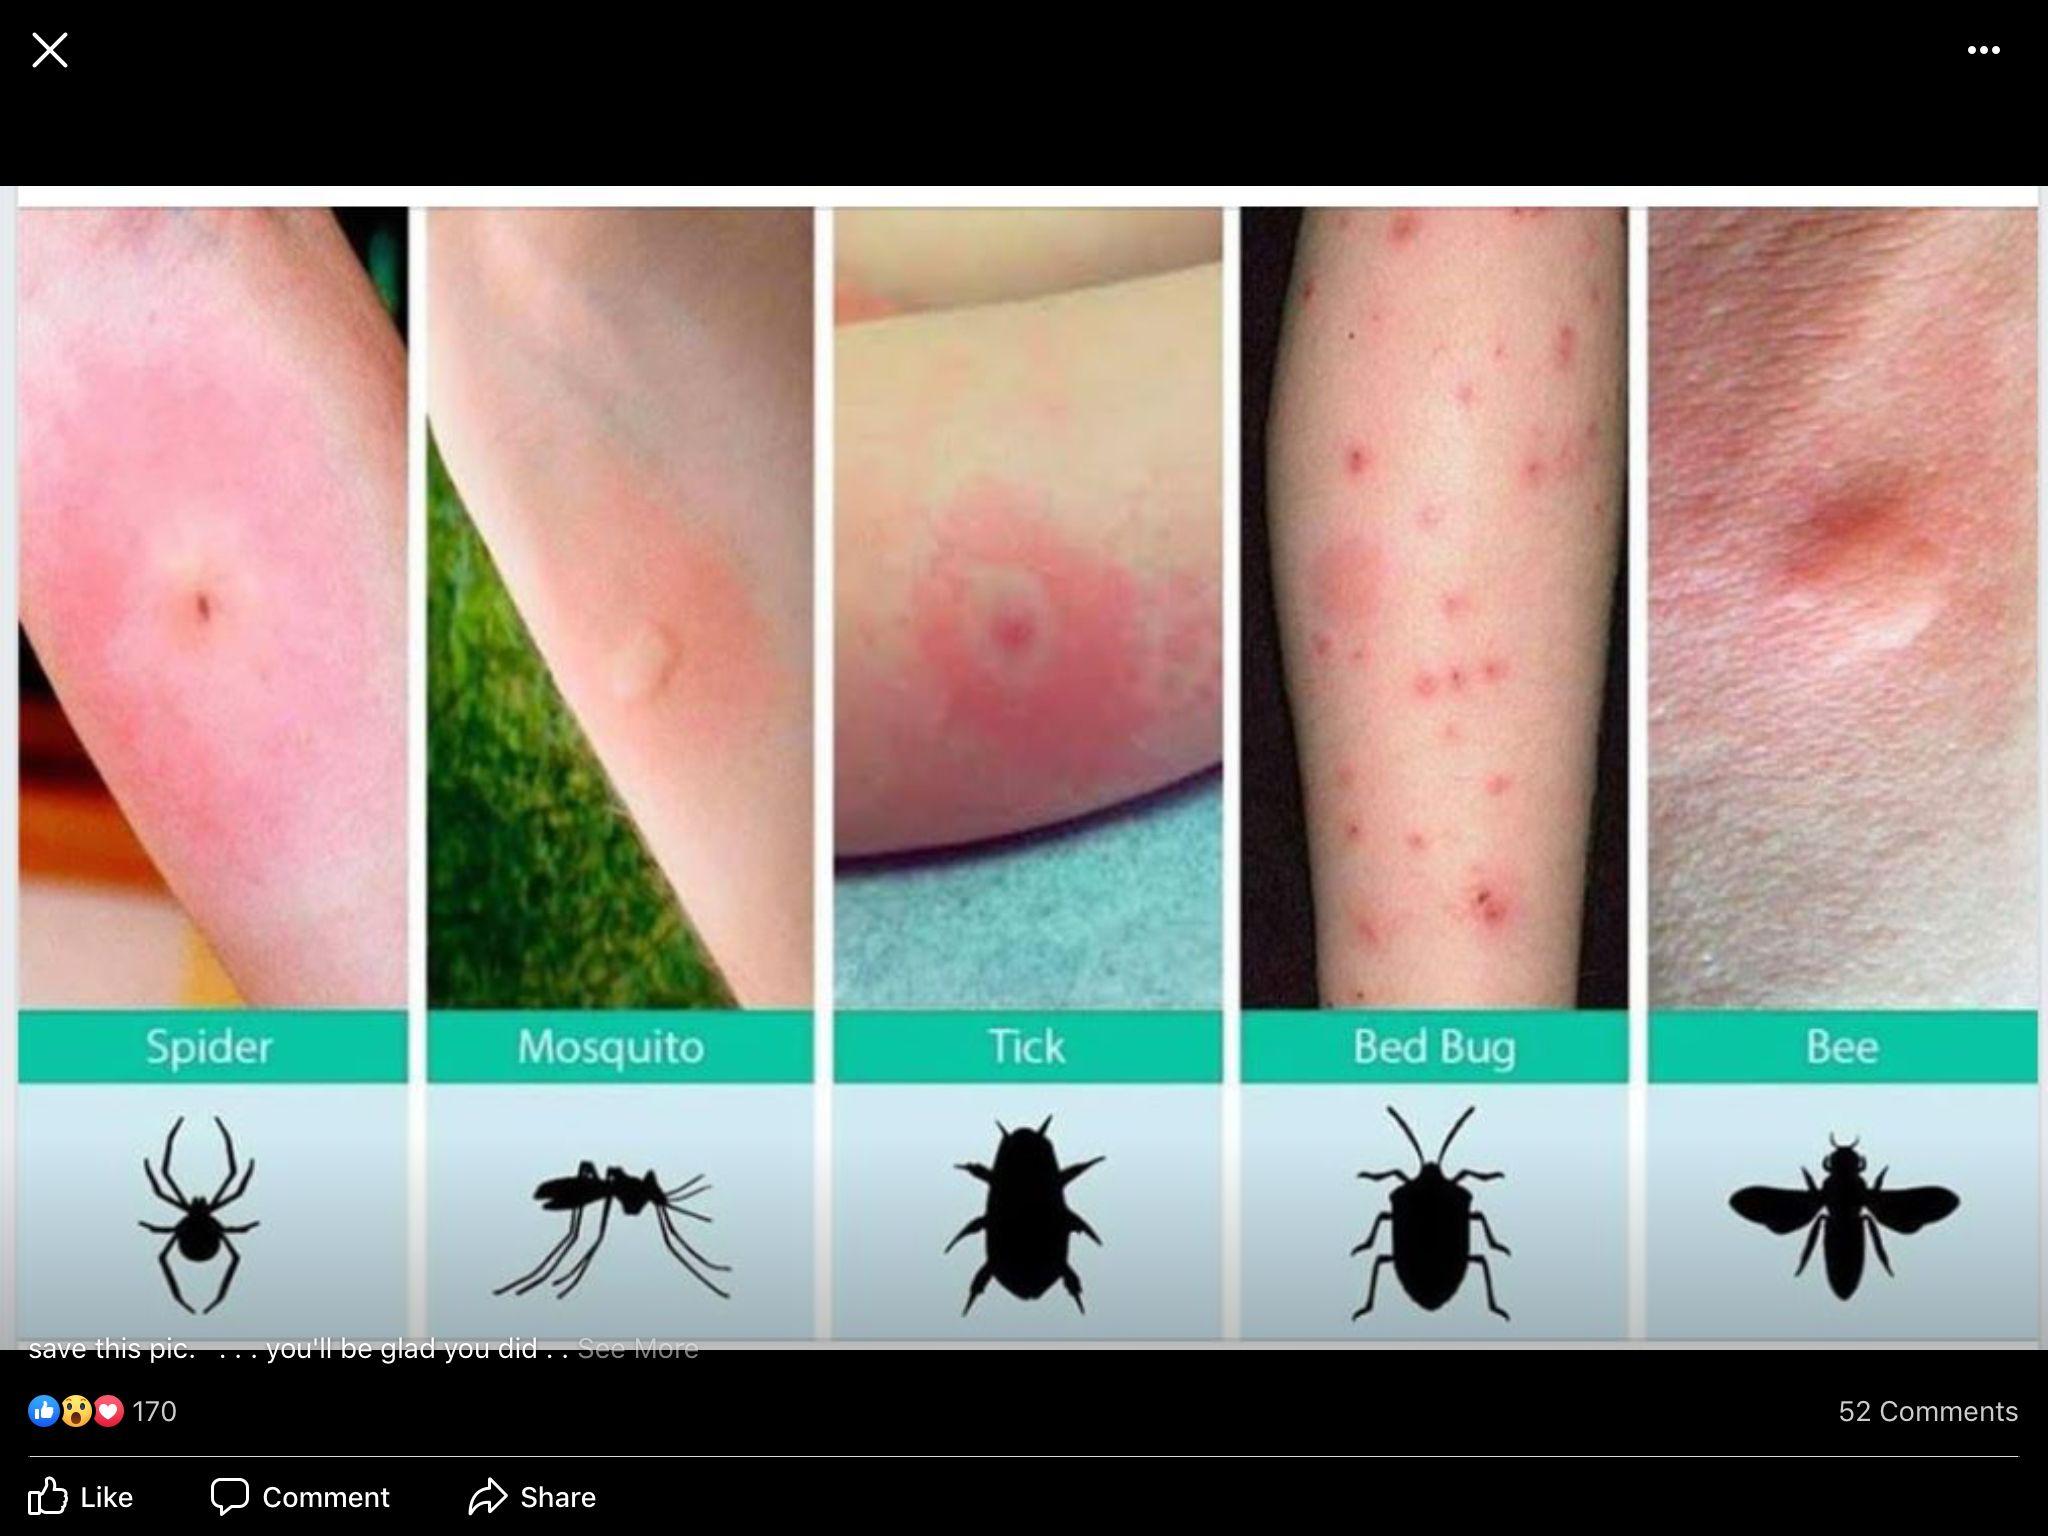 Pin by Kathy Blackmon on Likes Bed bug bites, Bug bites